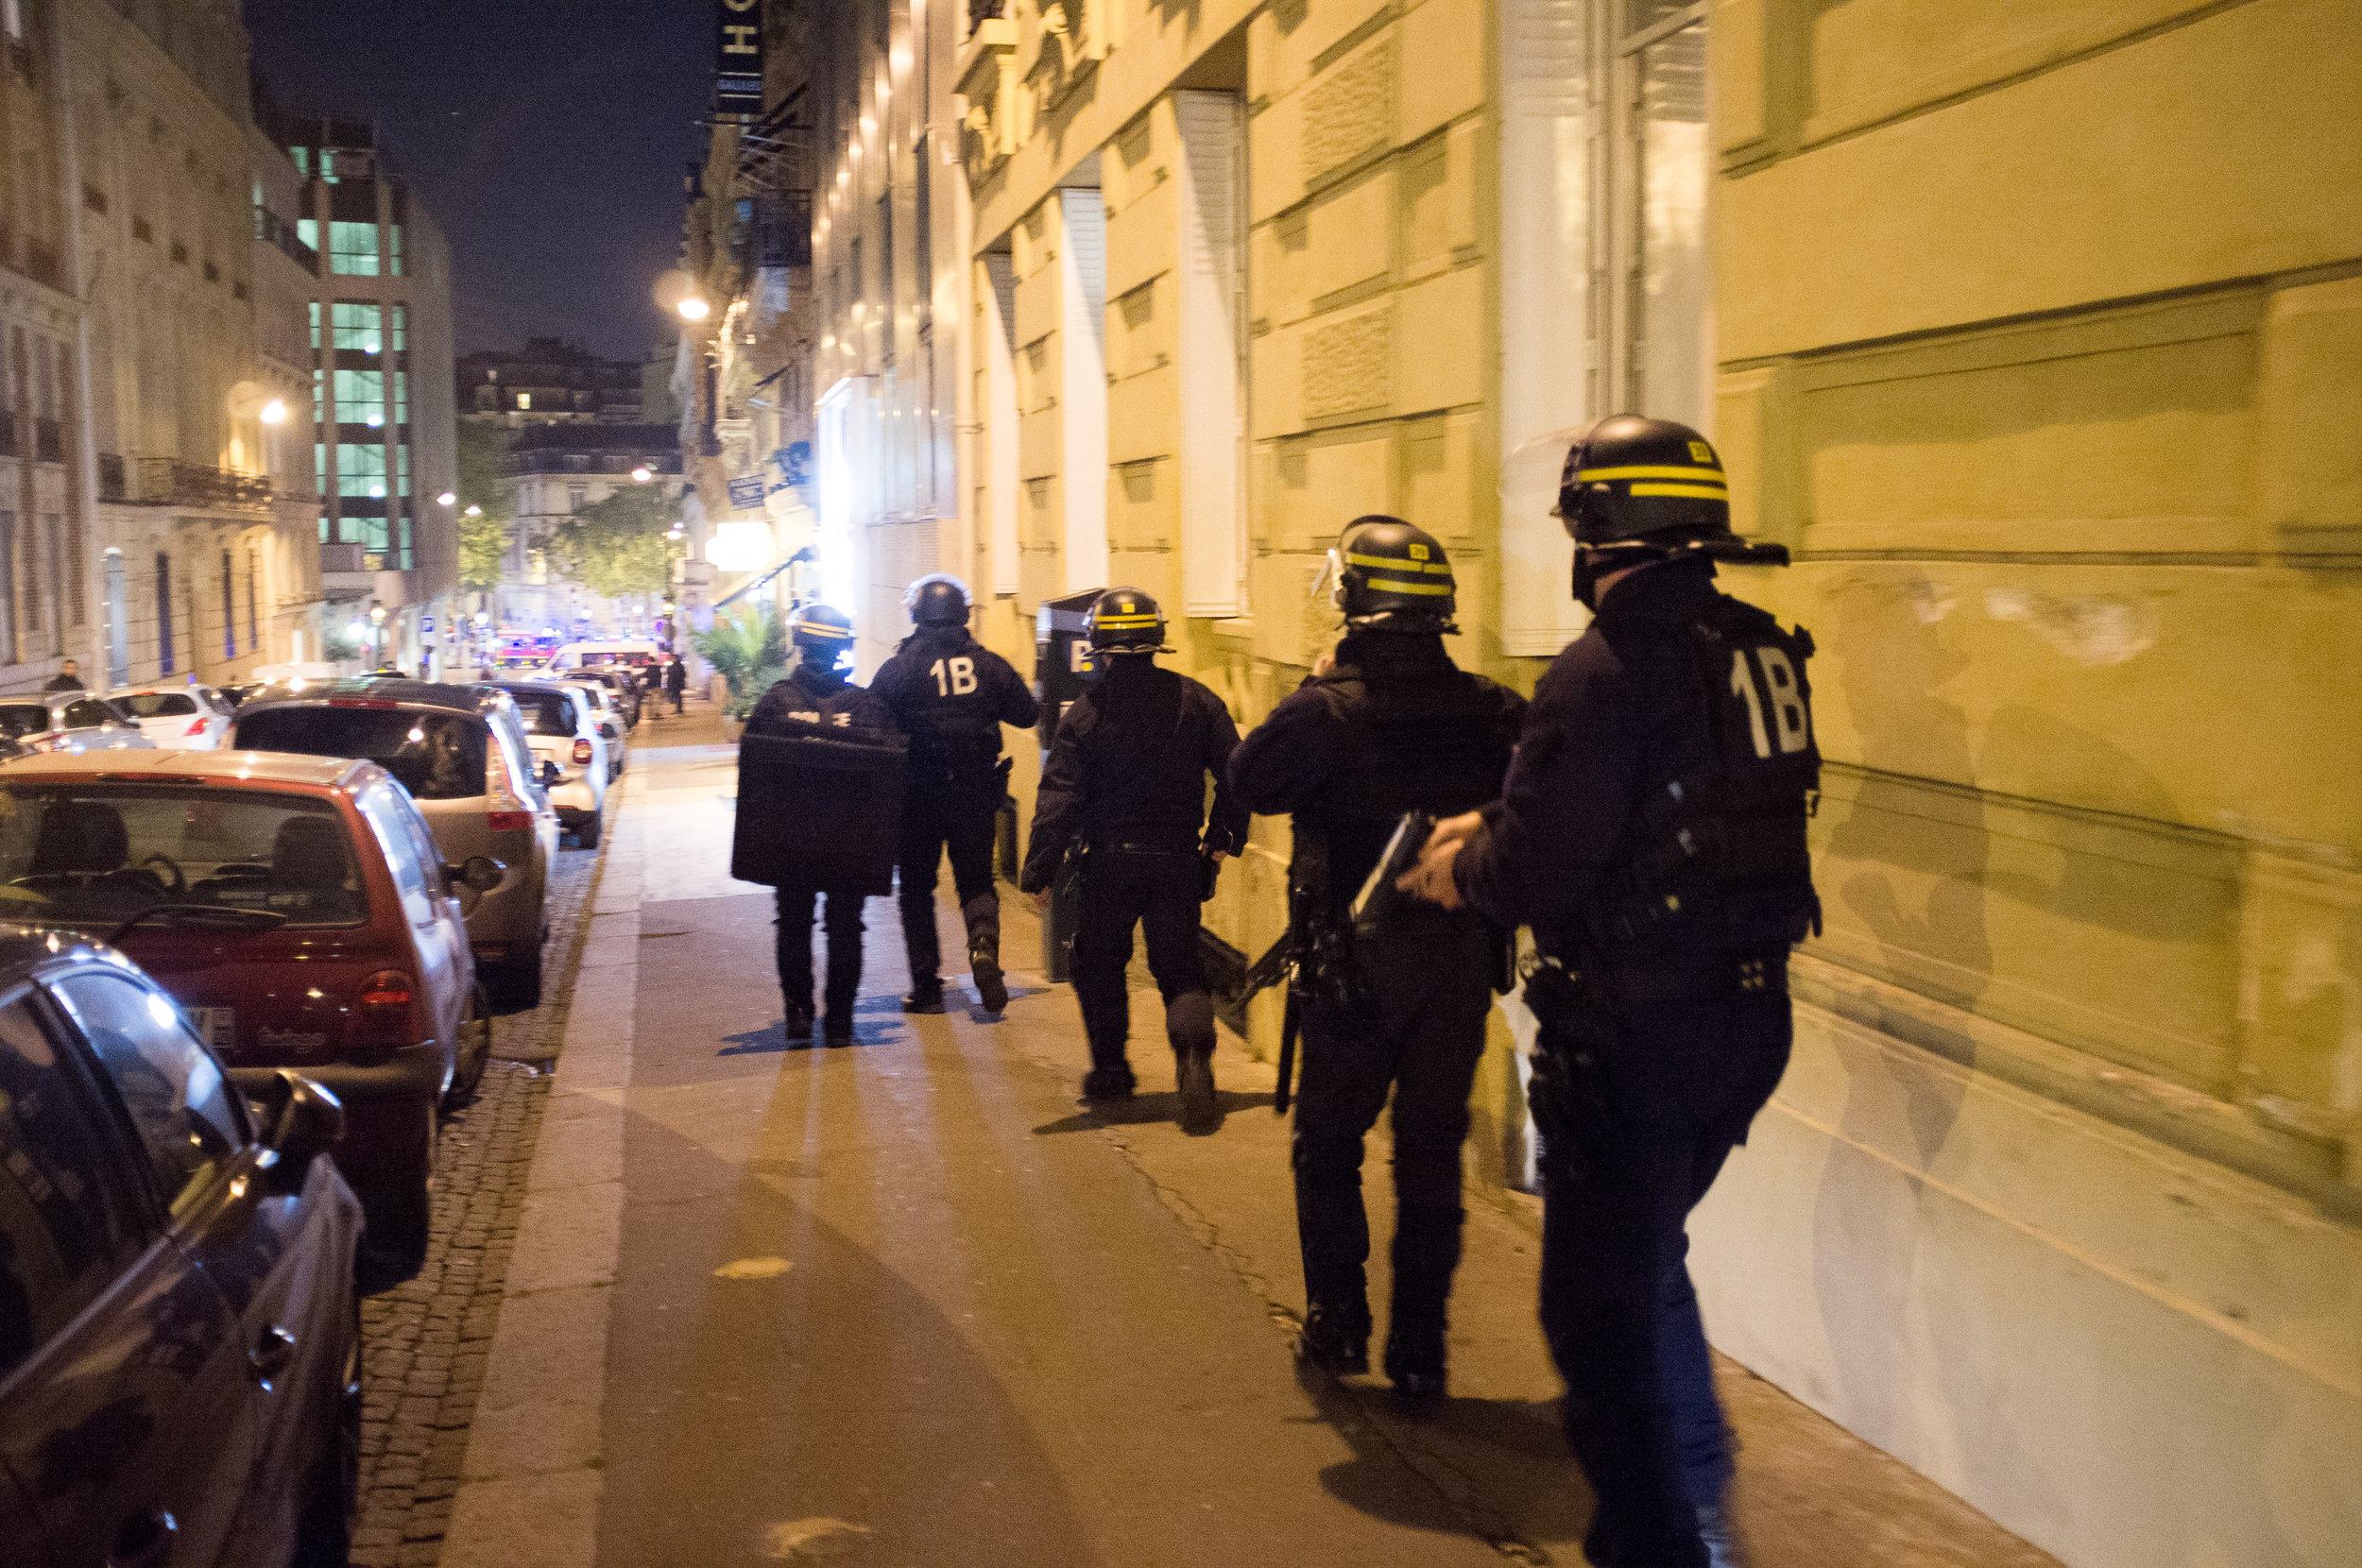 15-20170420-ATTAQUE-CHAMPS-ELYSEES-PARIS©Augustin-Le_Gall-Haytham-Pictures-DSCF6386.jpg